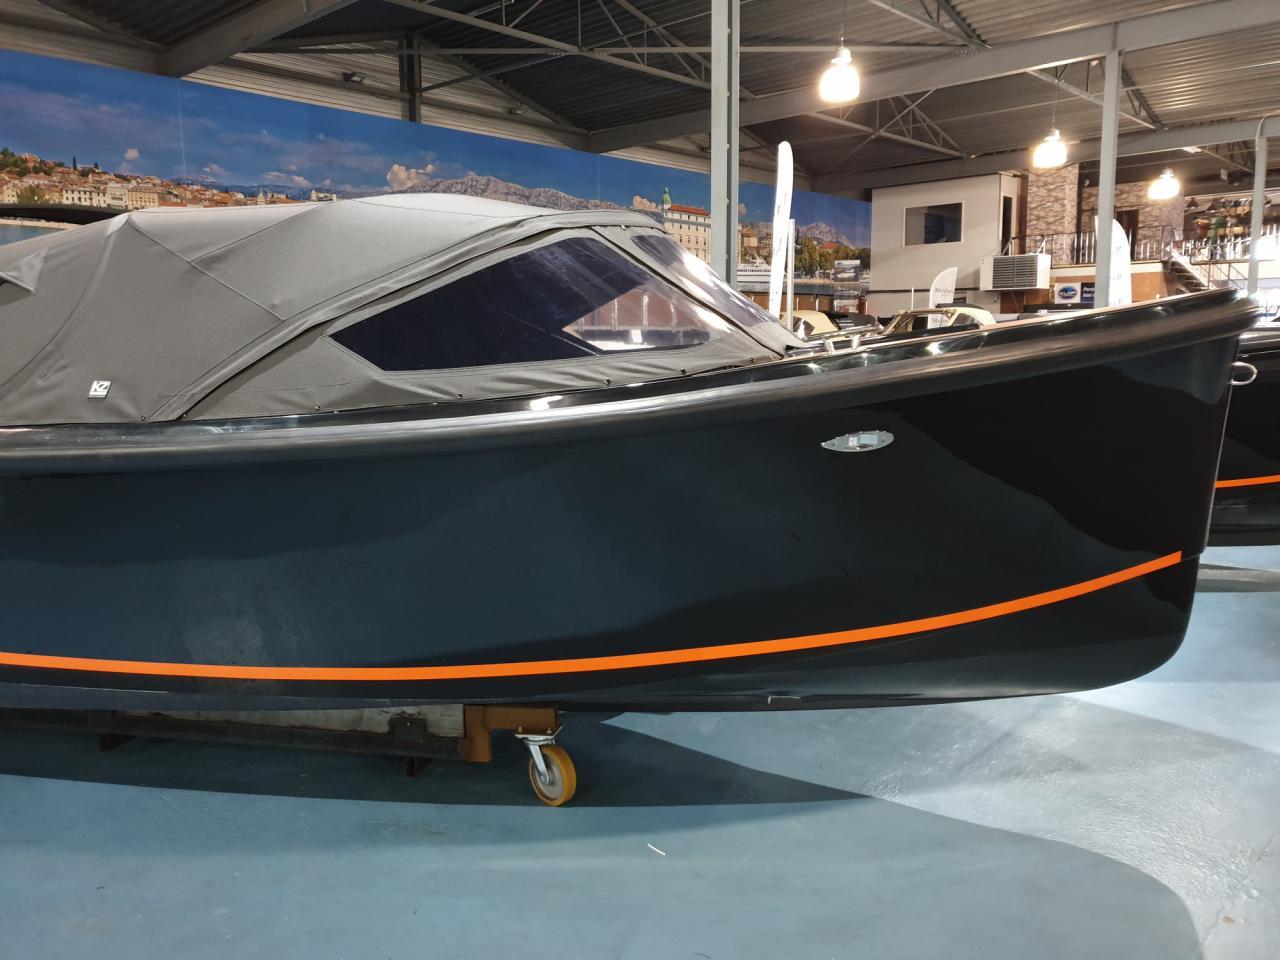 Maxima 750 Flying Lounge met Honda 60 pk - levering 2022! 3